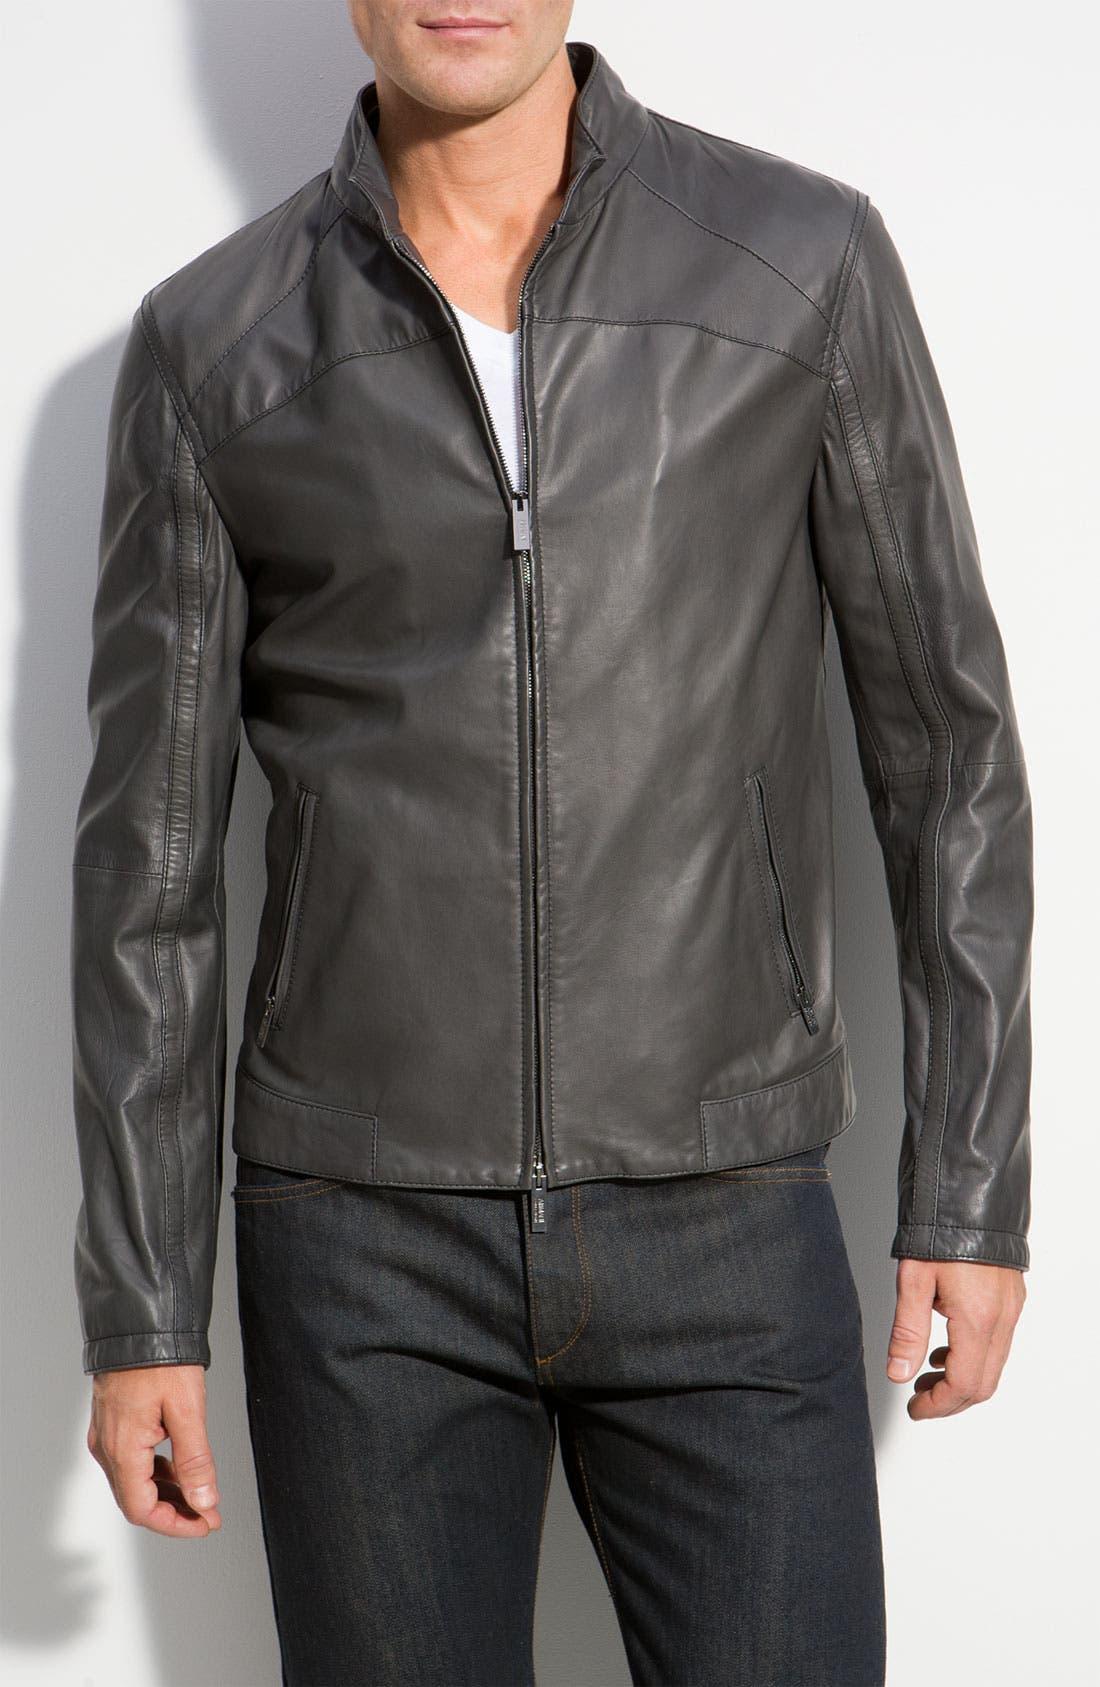 Main Image - Armani Collezioni Leather Jacket